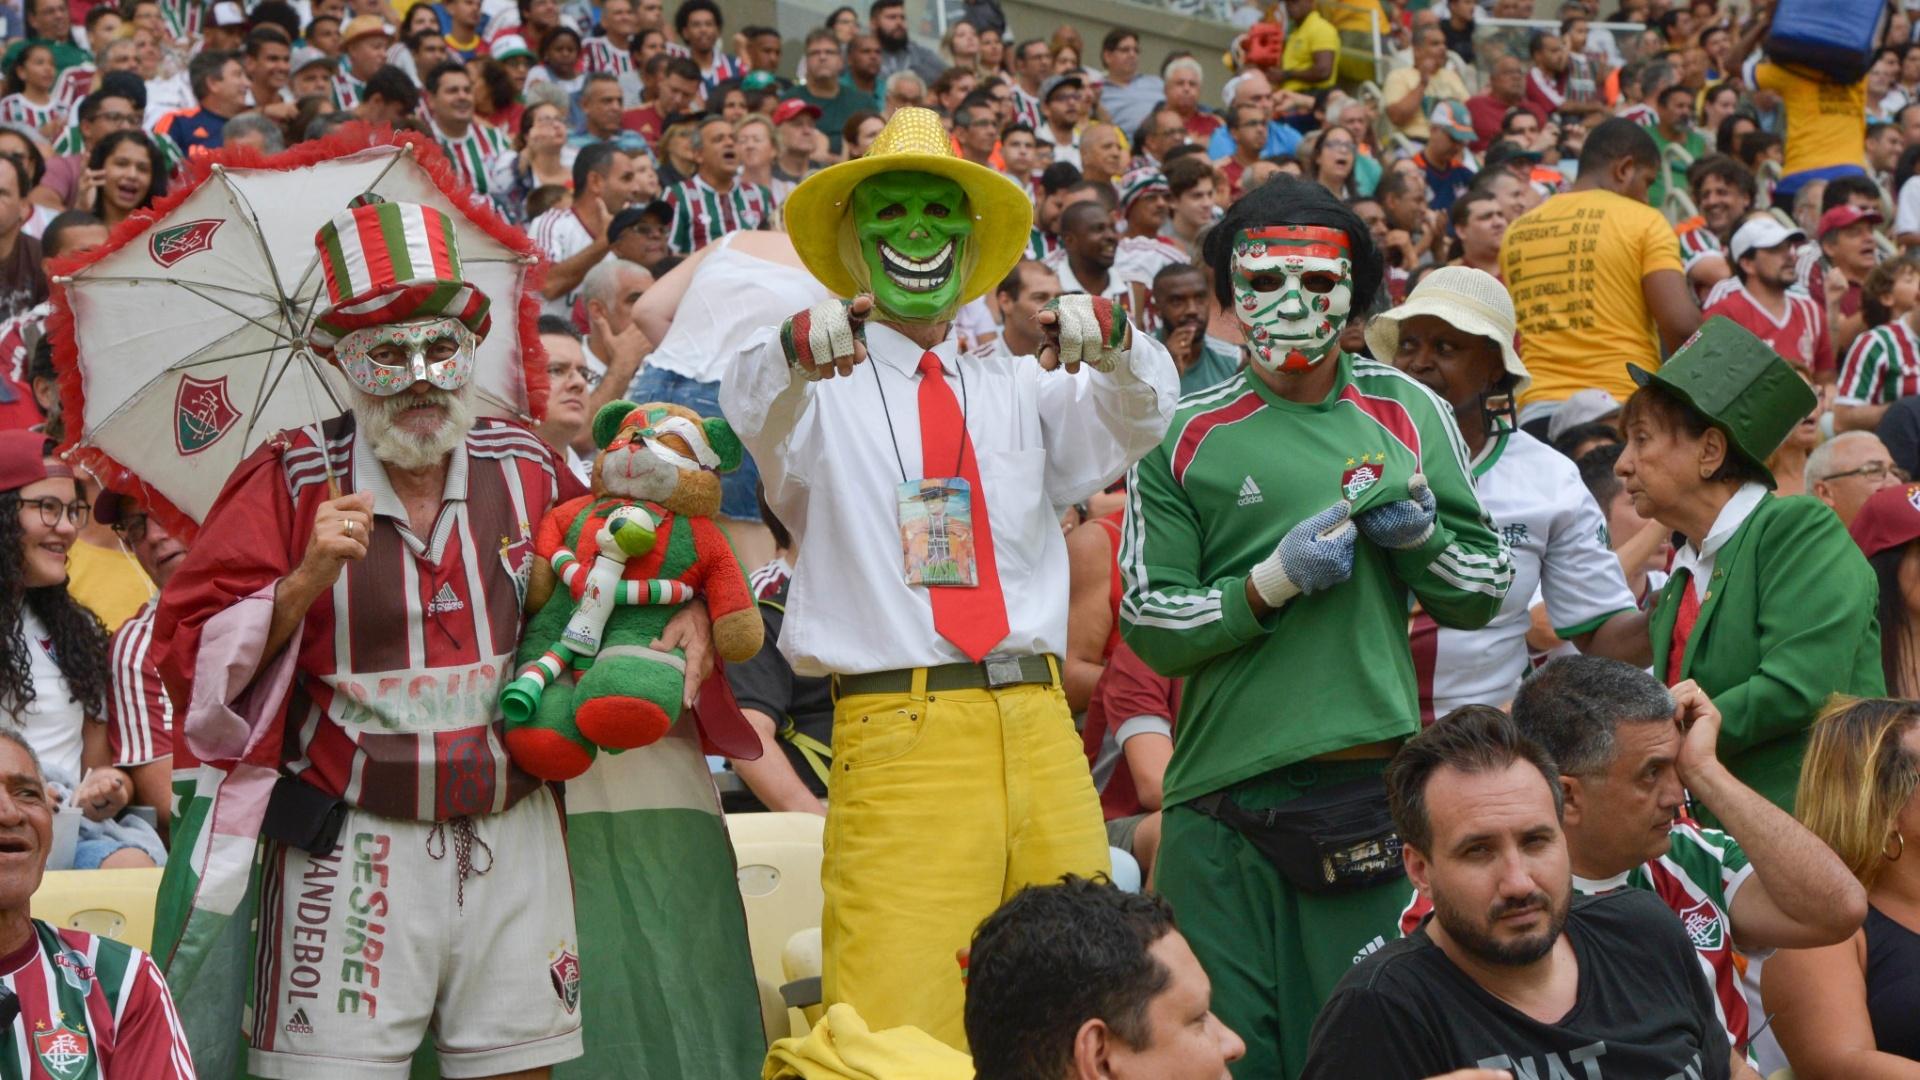 Torcedores do Fluminense acompanham a partida contra o Avaí